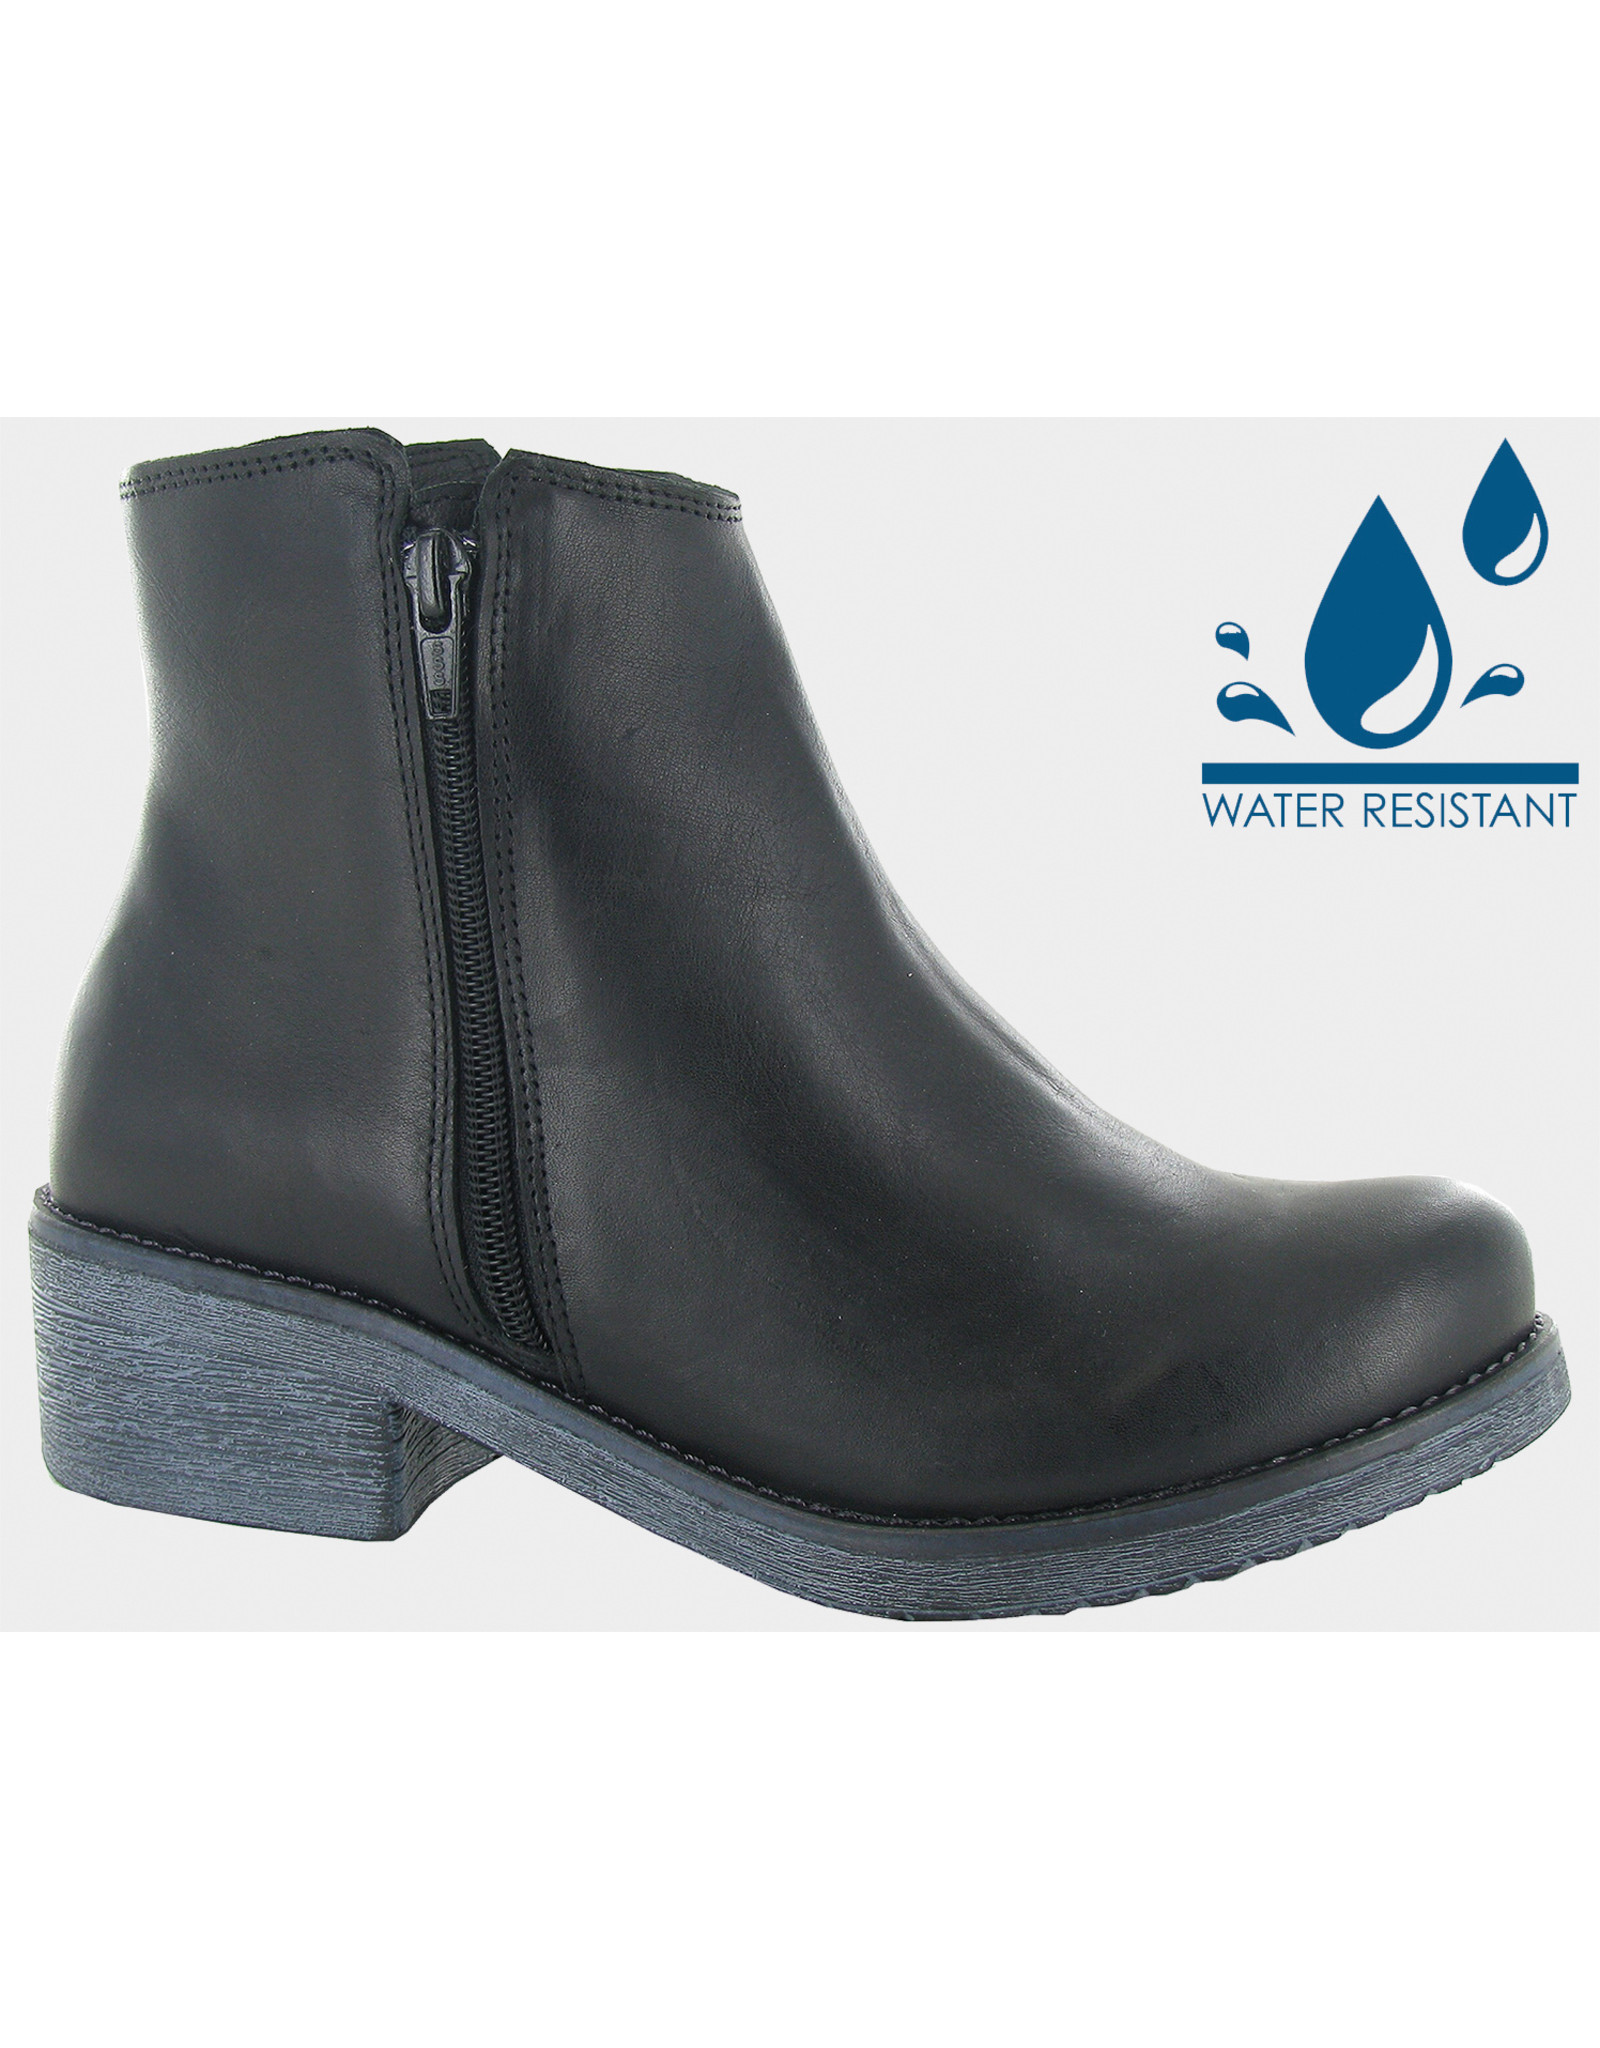 NAOT WOMEN'S WANDER-WATER RESISTANT BLACK